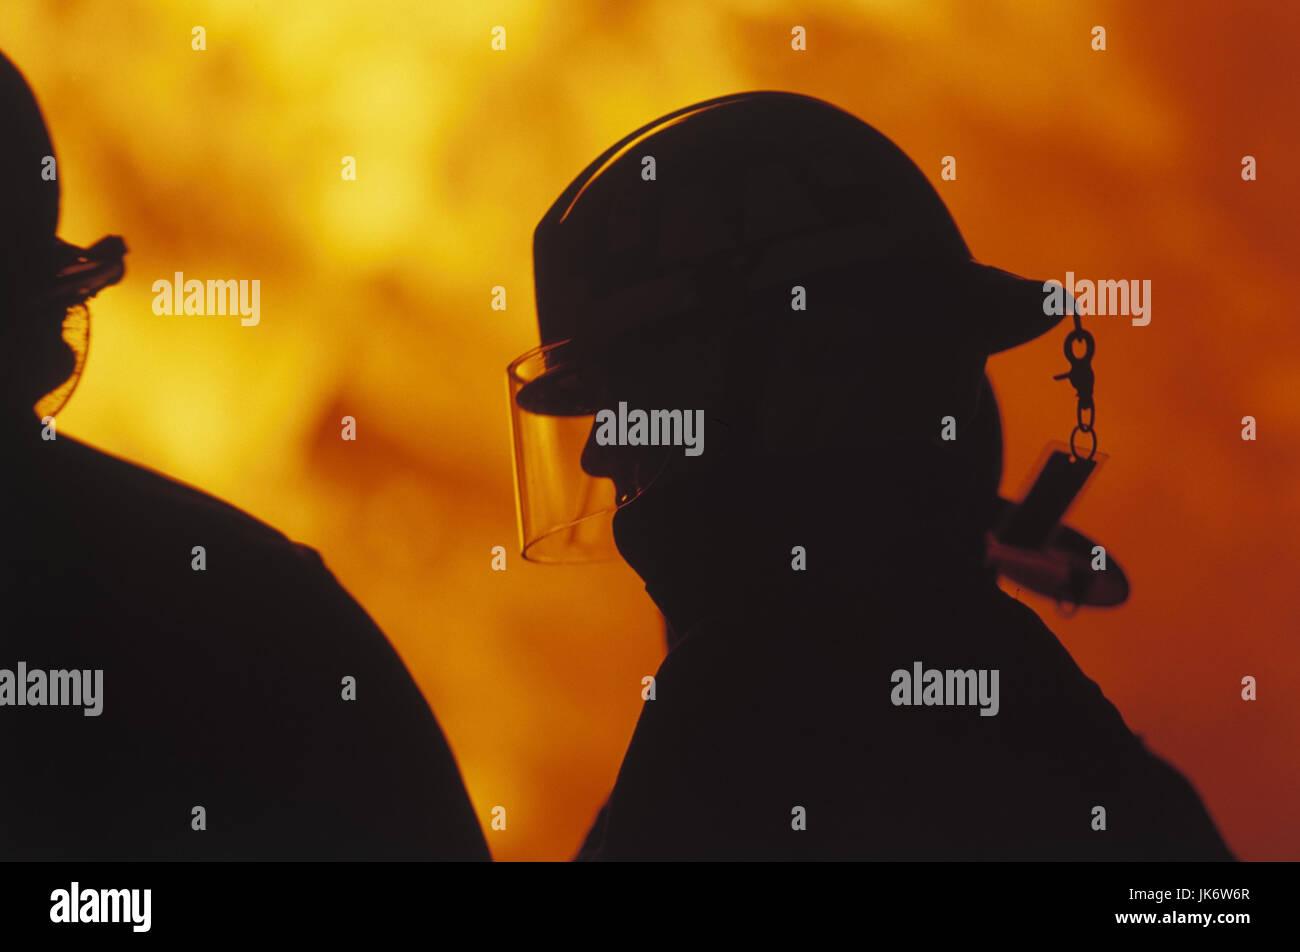 Brandbekämpfung, Silhouette,  Feuerwehrmänner, Detail  Brand, brennen, Feuer, Flammen, Zerstörung, - Stock Image